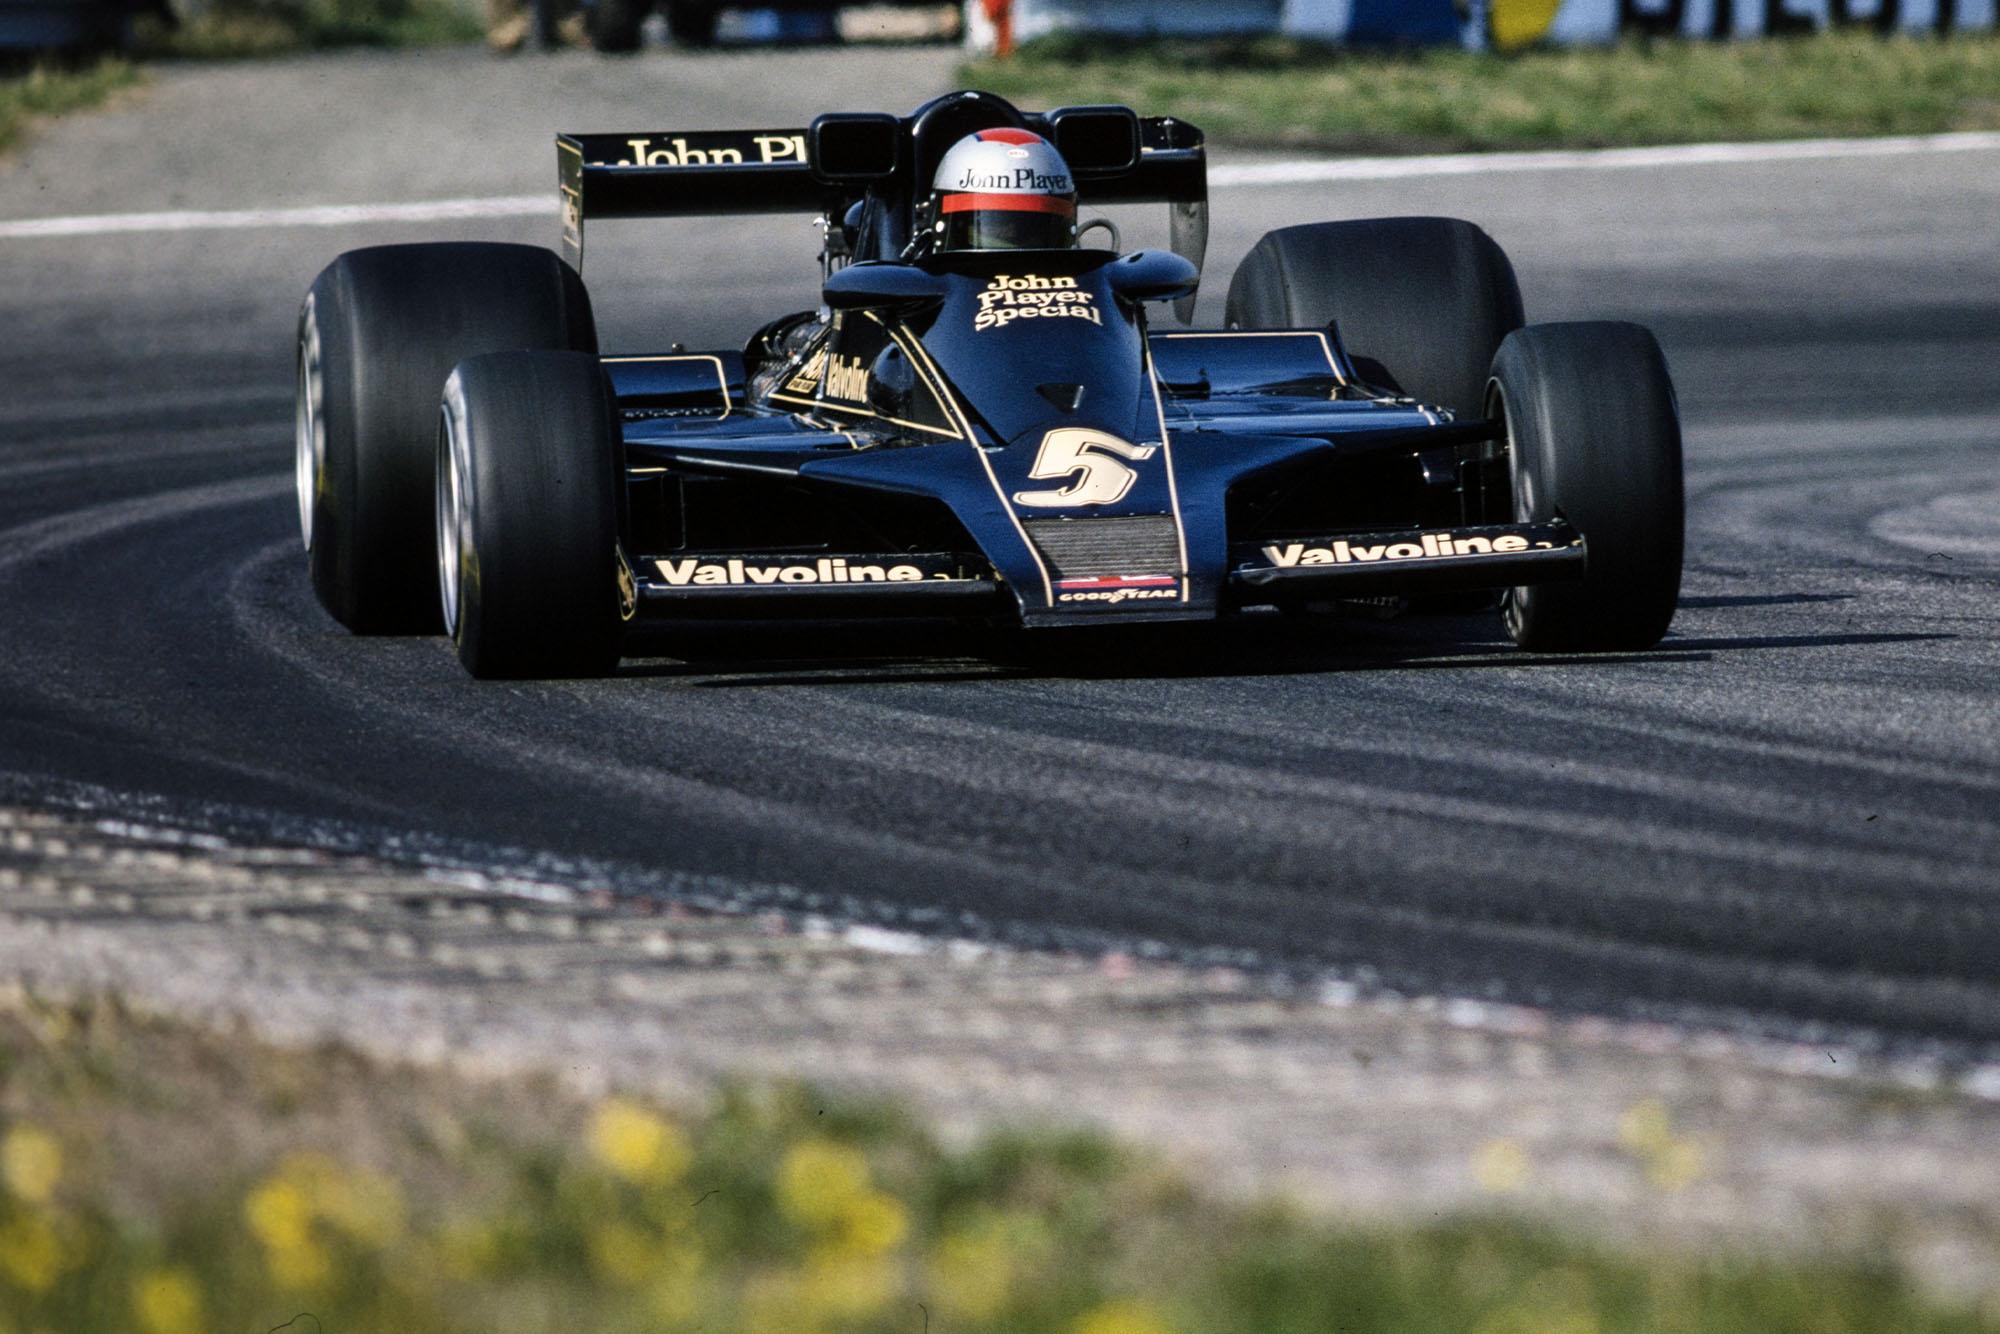 Mario Andretti (Lotus) at the 1977 Dutch Grand Prix, Zandvoort.